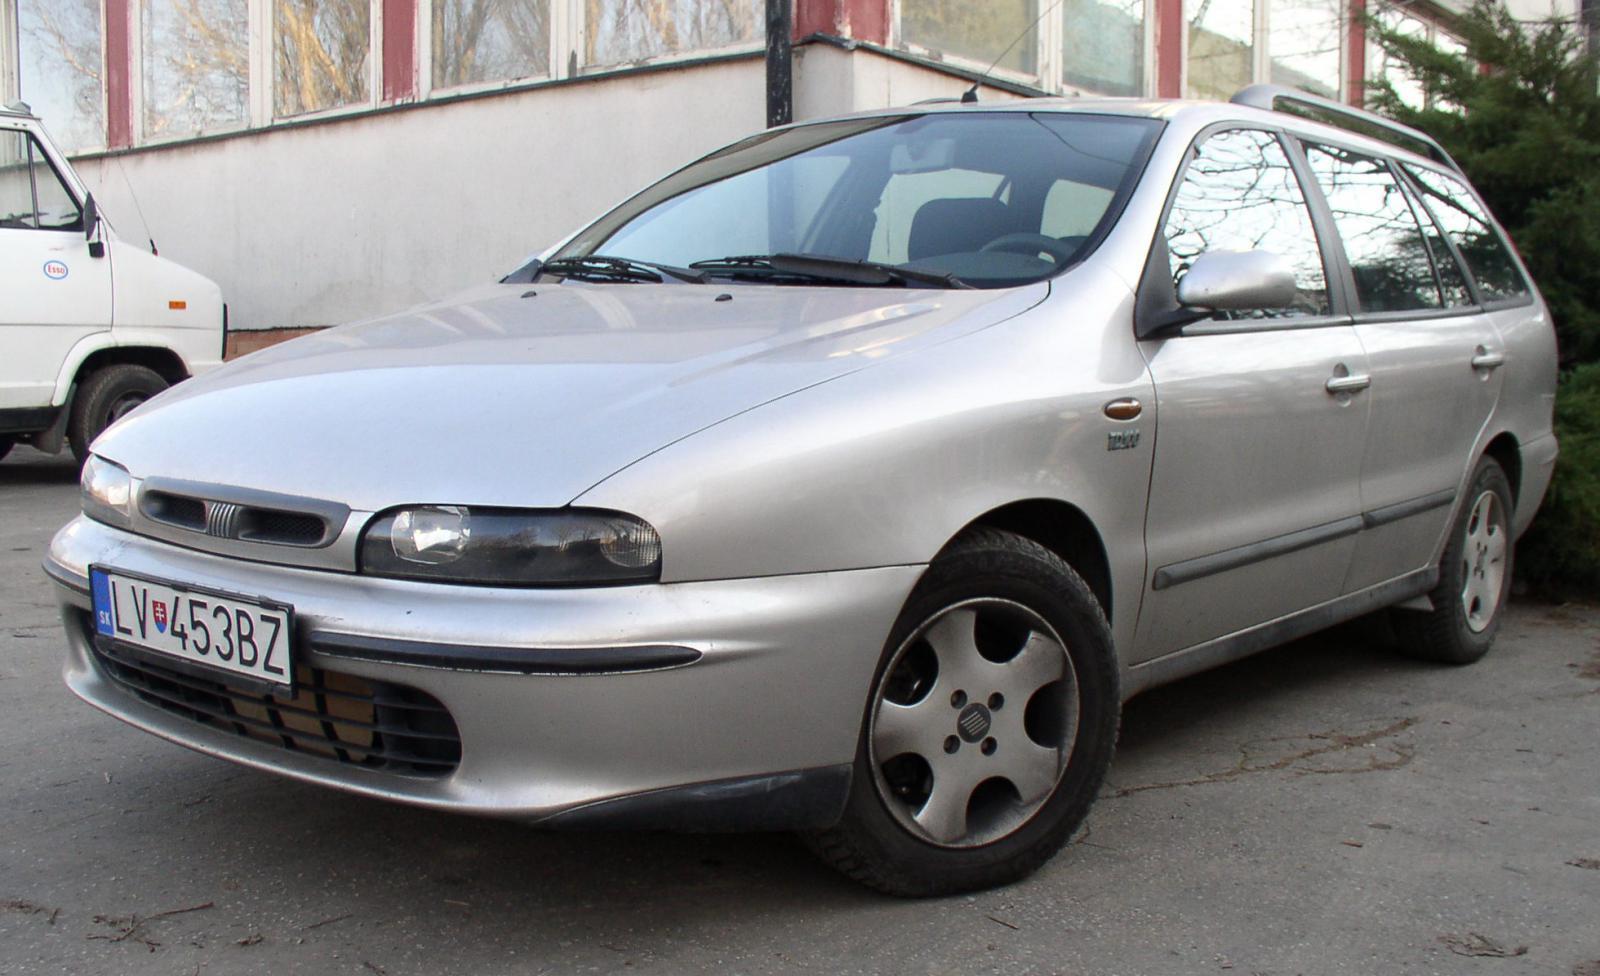 1997 Fiat Marea  185  1 9  117 Cui  Diesel 73 Kw